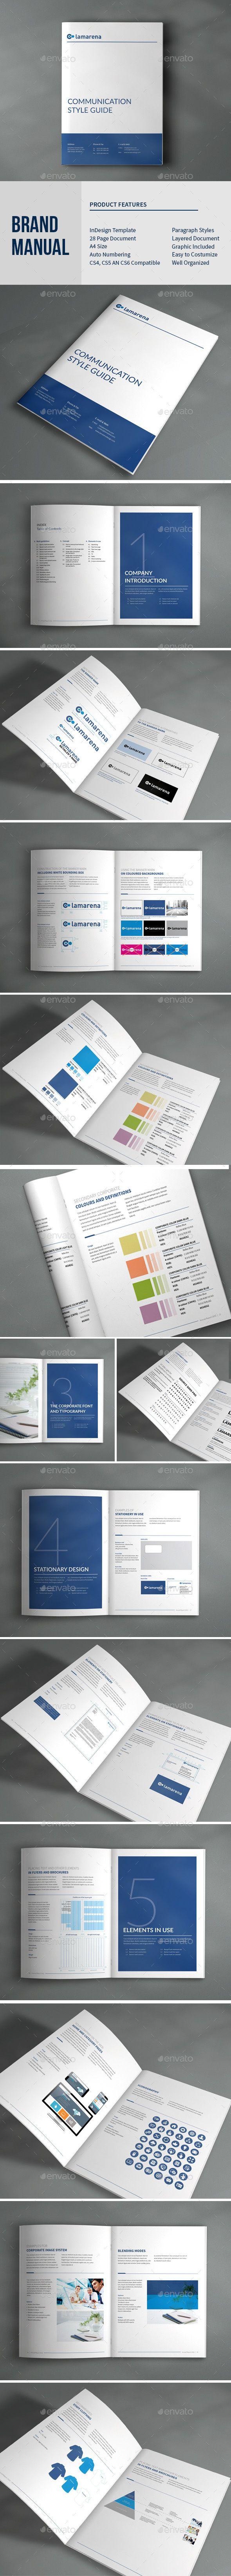 Brand Manual Brochure Template InDesign INDD #design Download: http://graphicriver.net/item/brand-manual/13109035?ref=ksioks